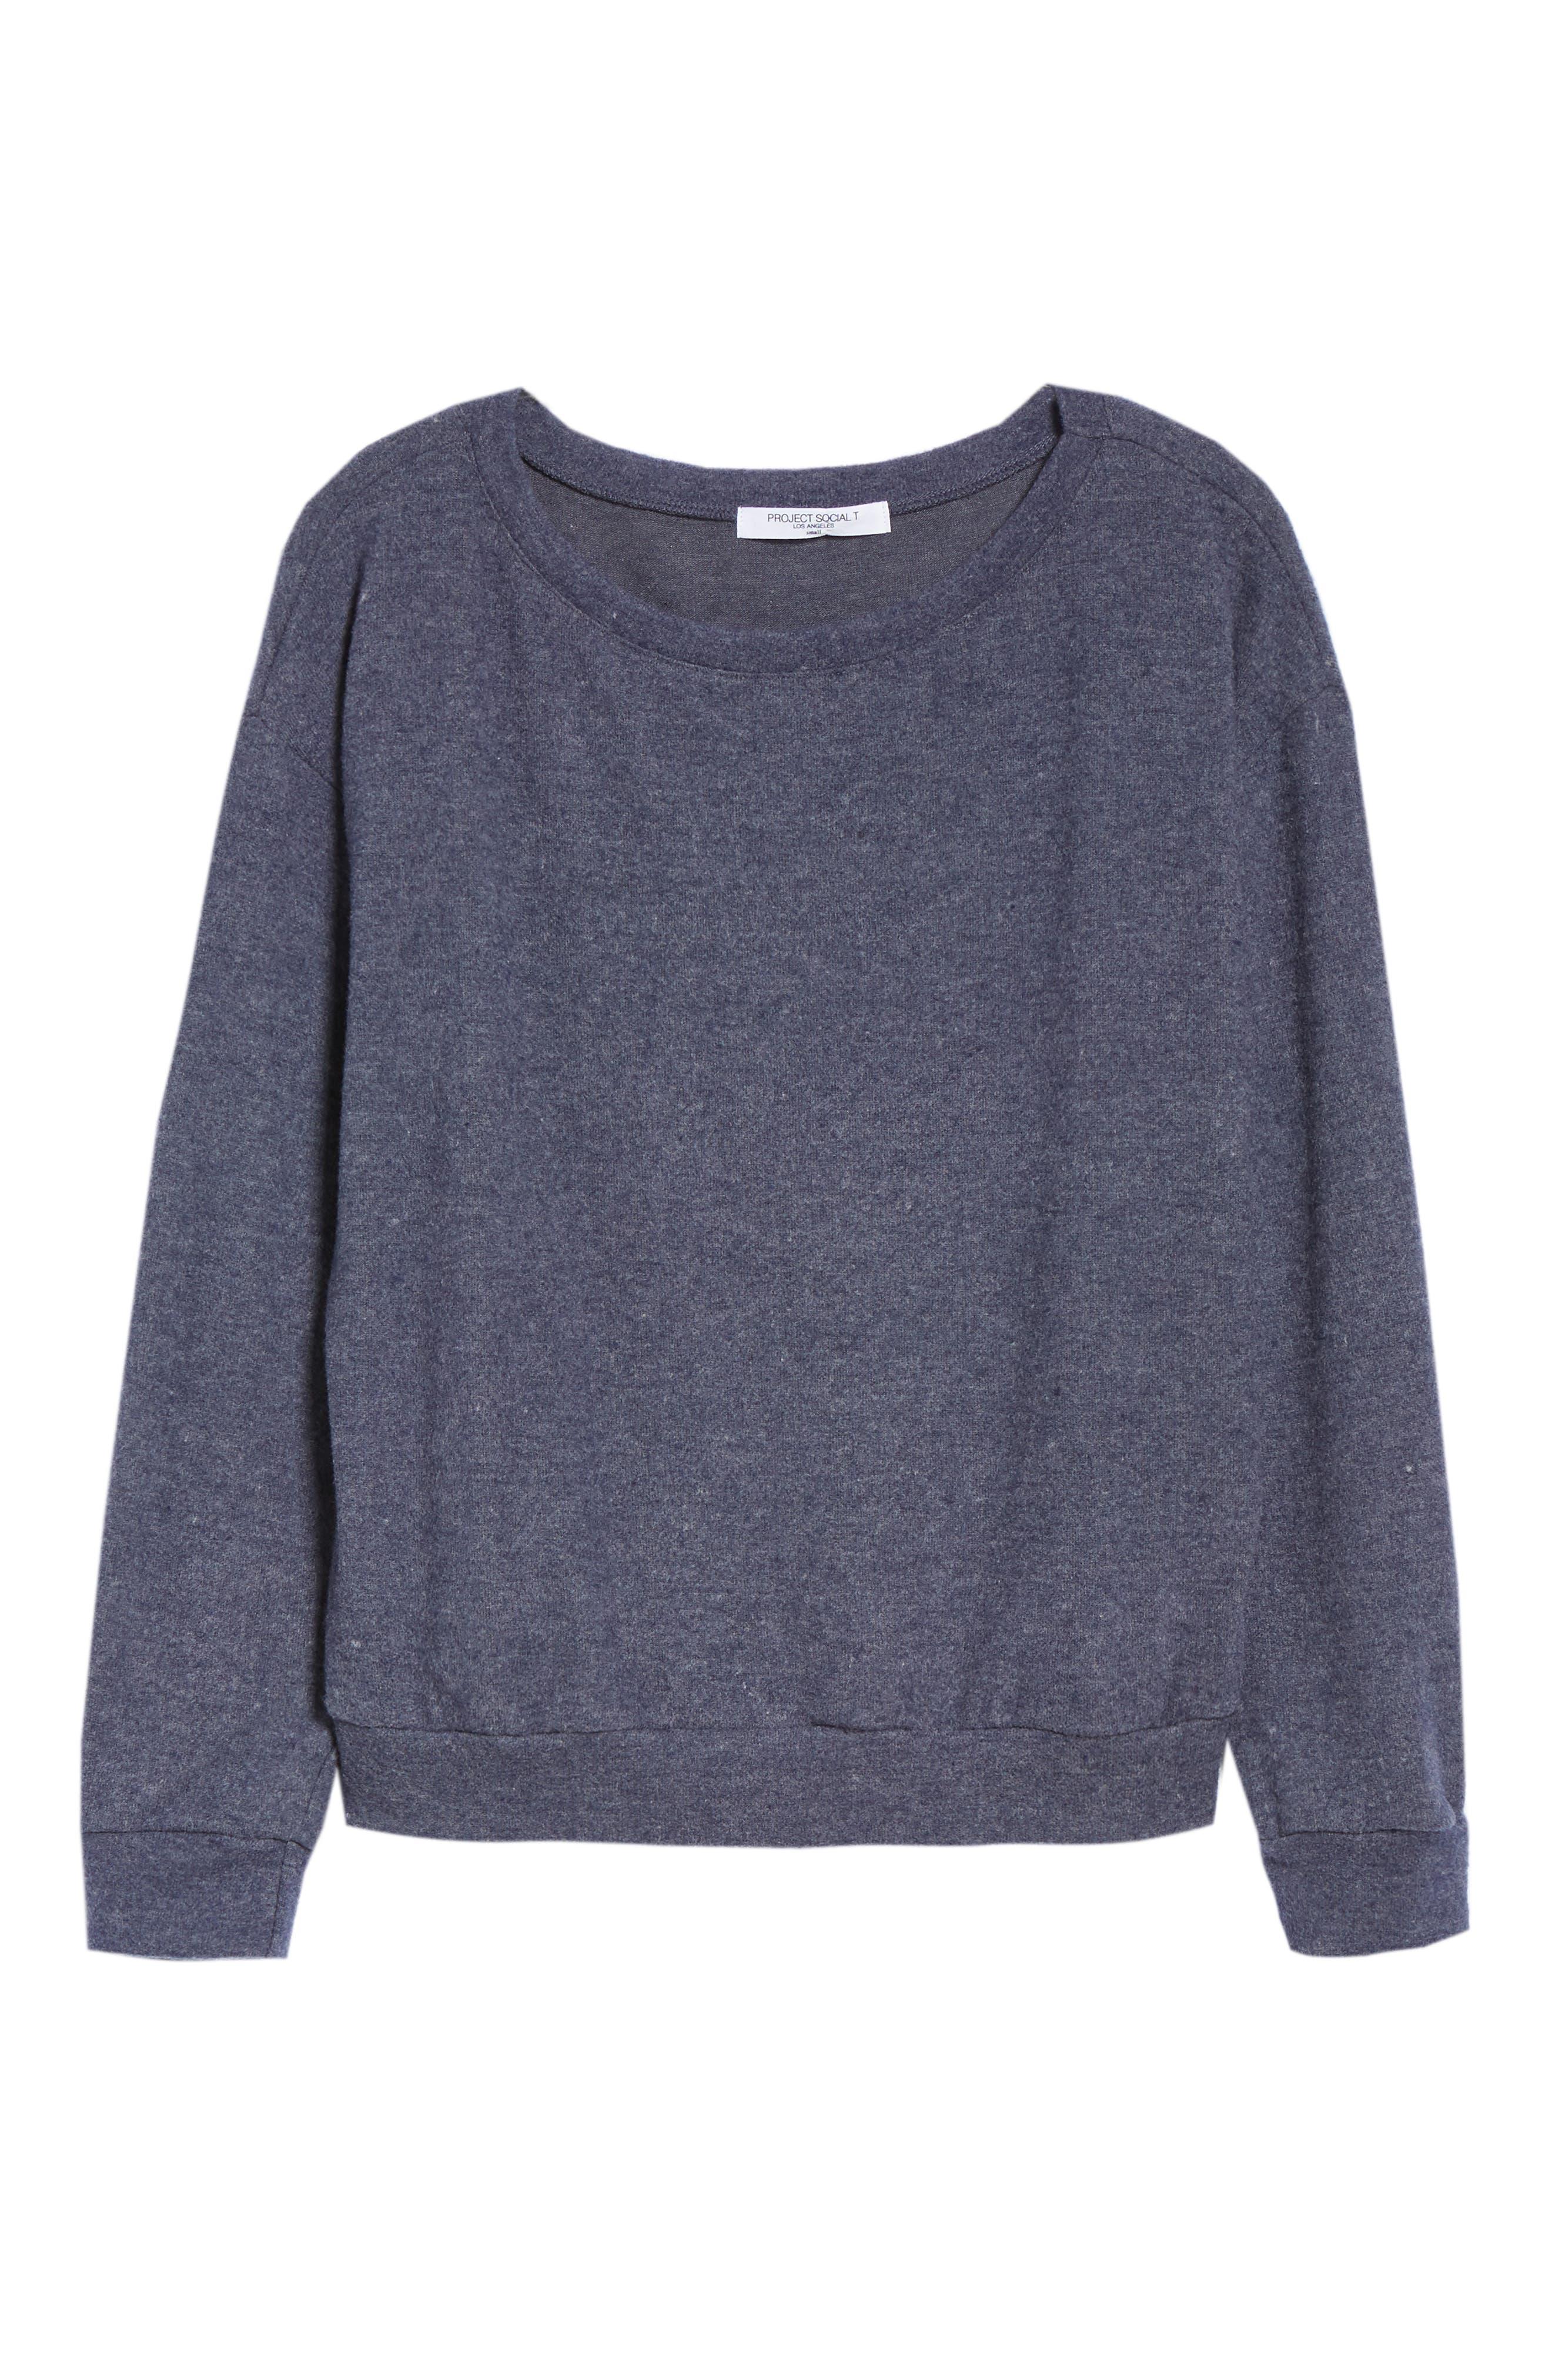 Keys Sweatshirt,                             Alternate thumbnail 6, color,                             HEATHER NAVY